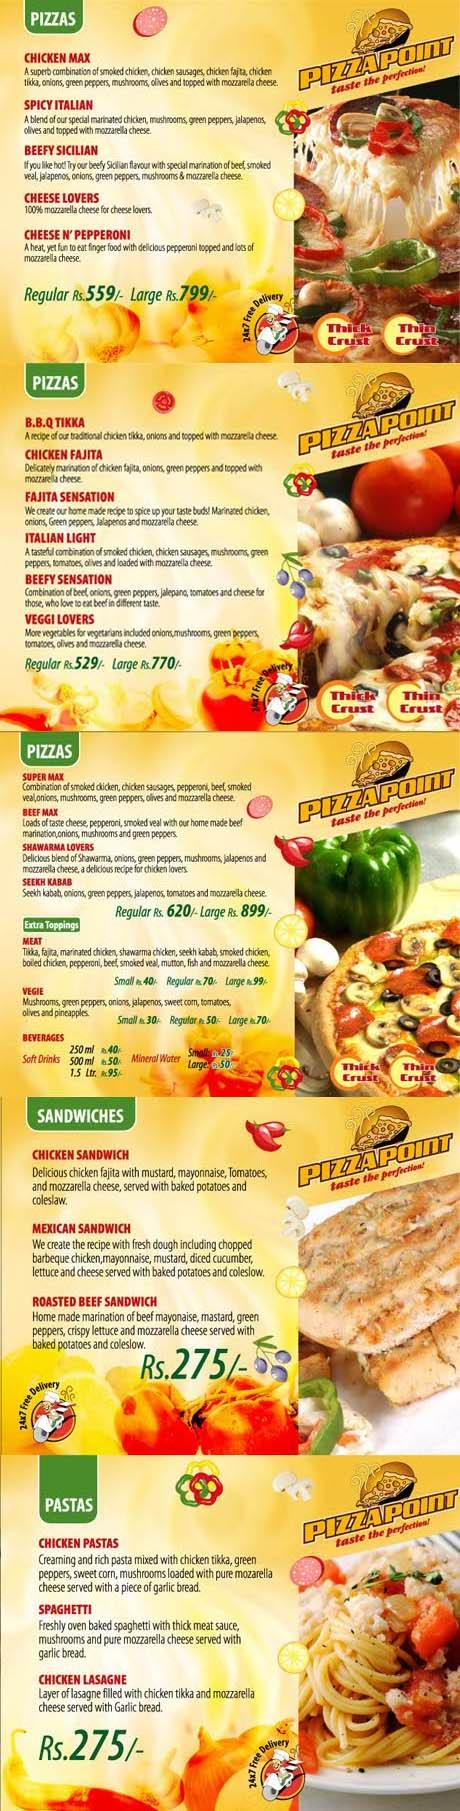 pizza point menu 1